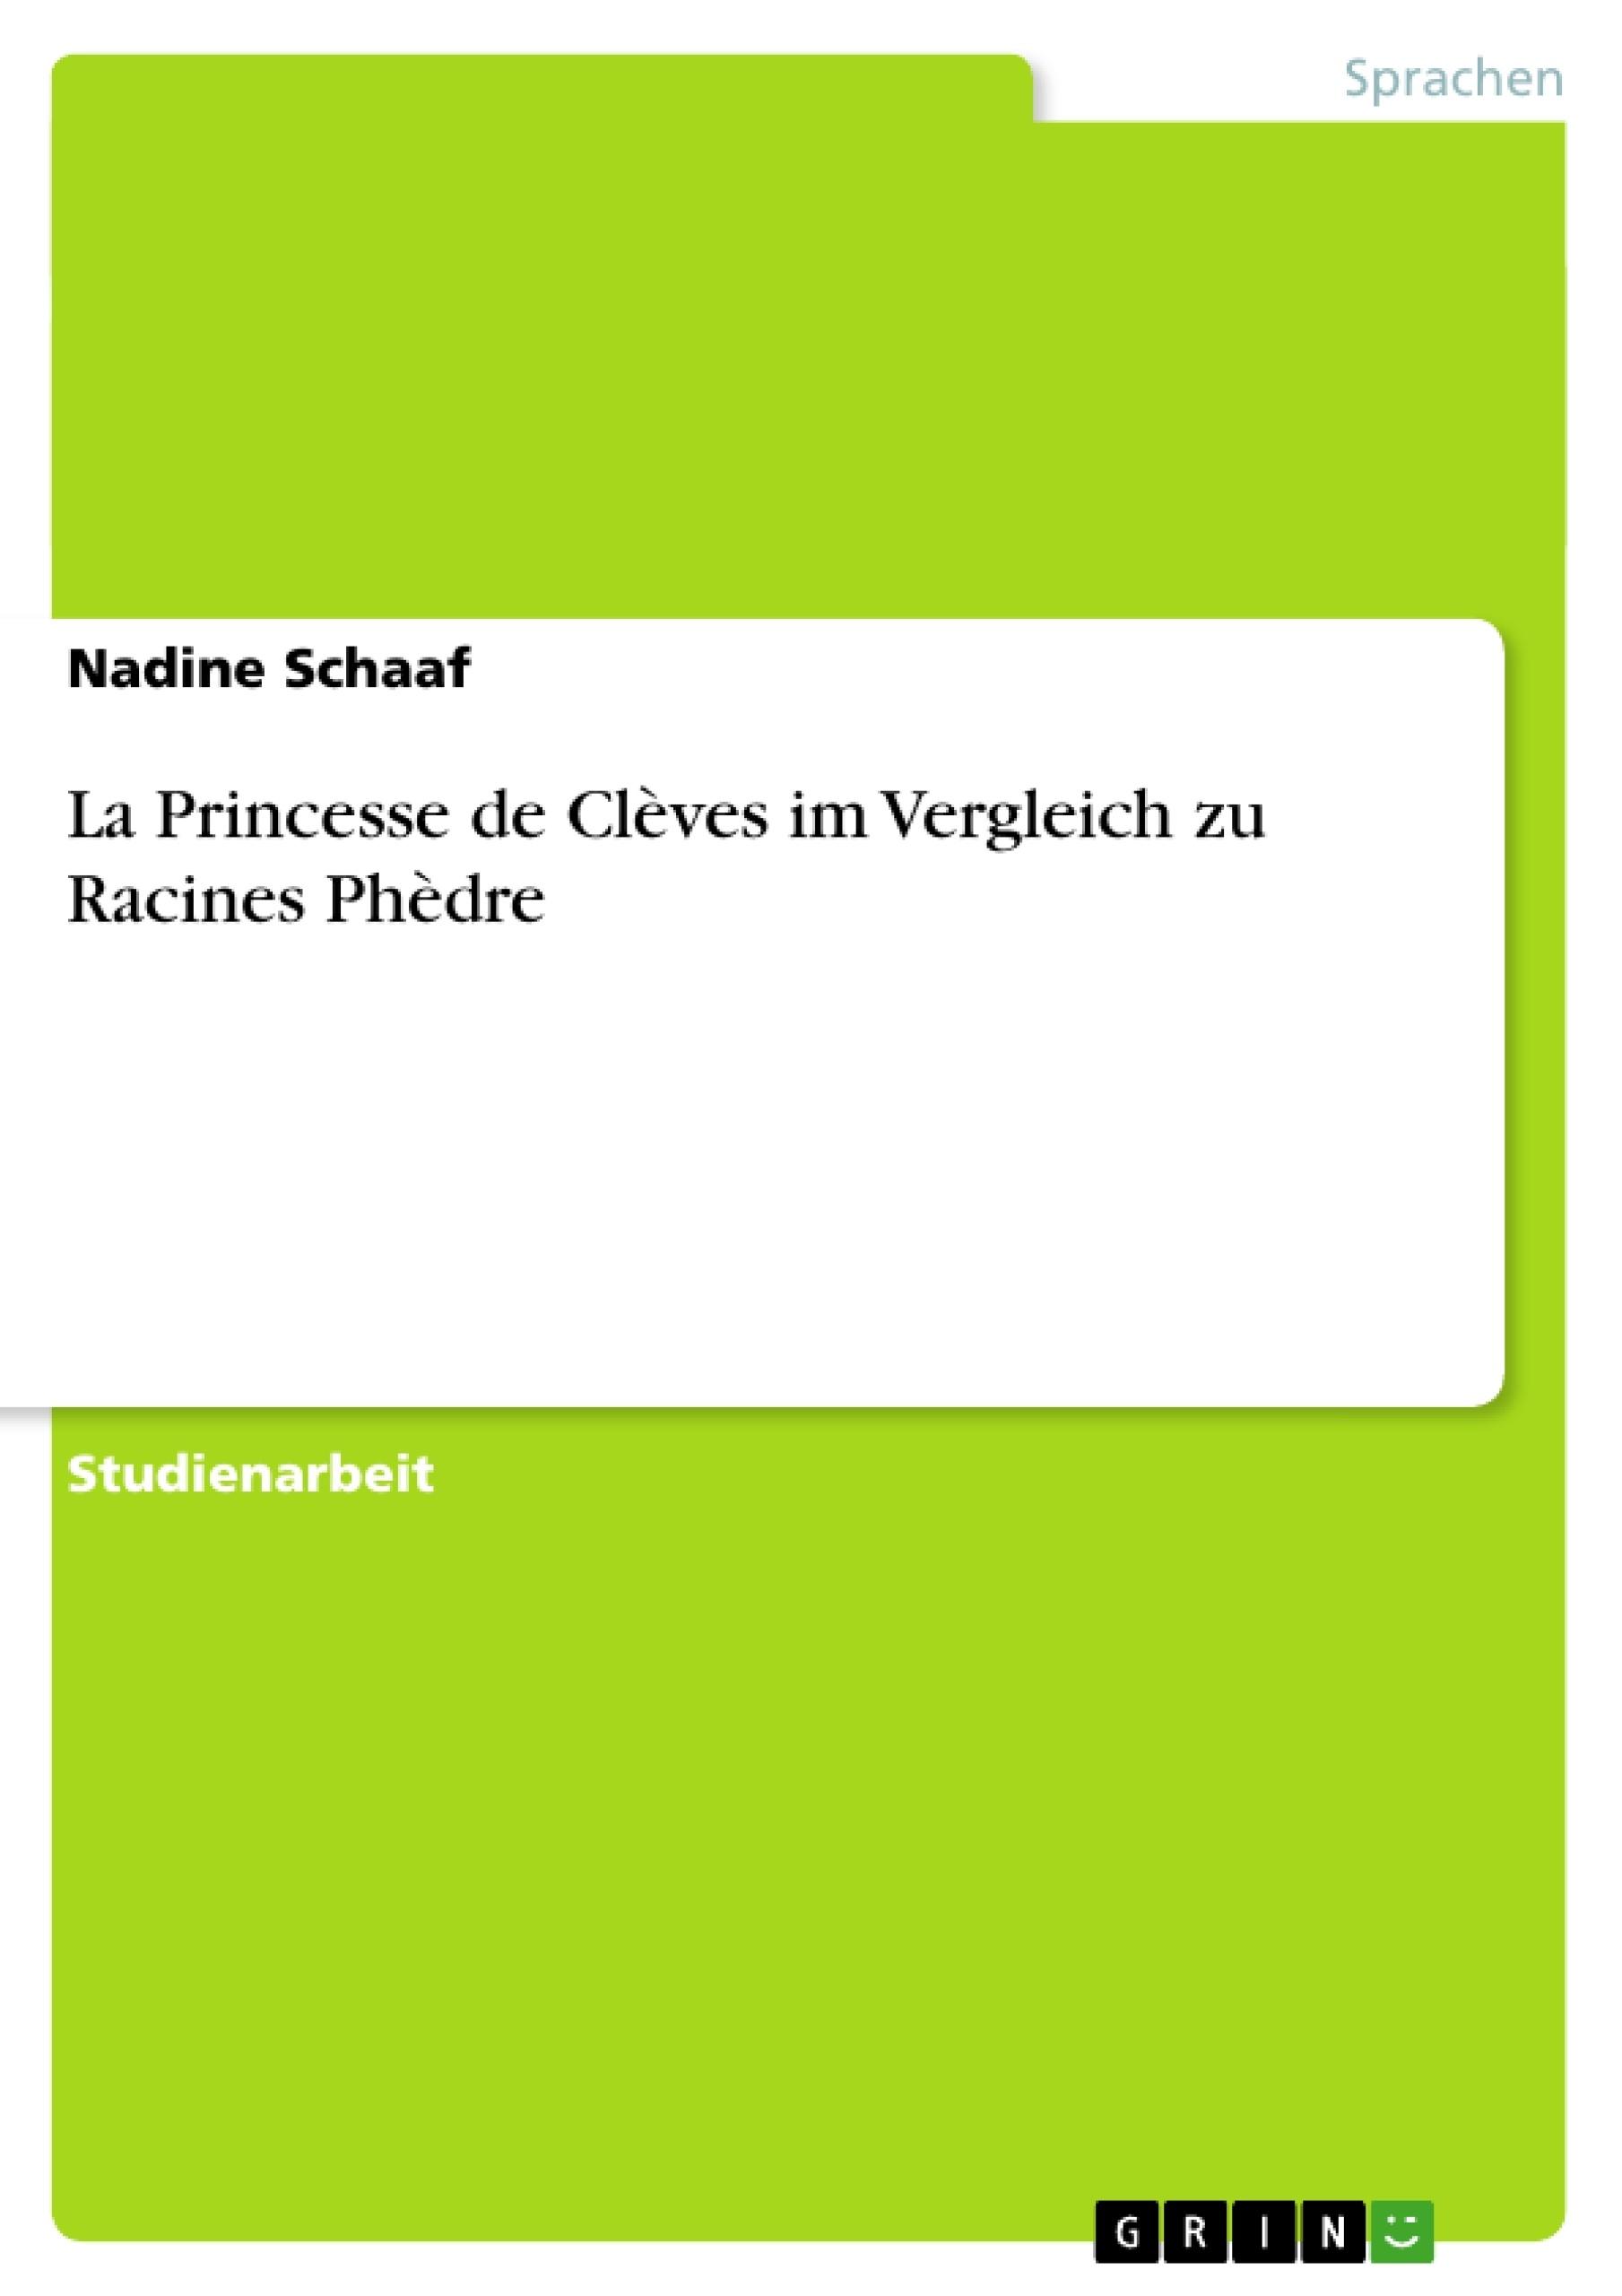 Titel: La Princesse de Clèves im Vergleich zu Racines Phèdre